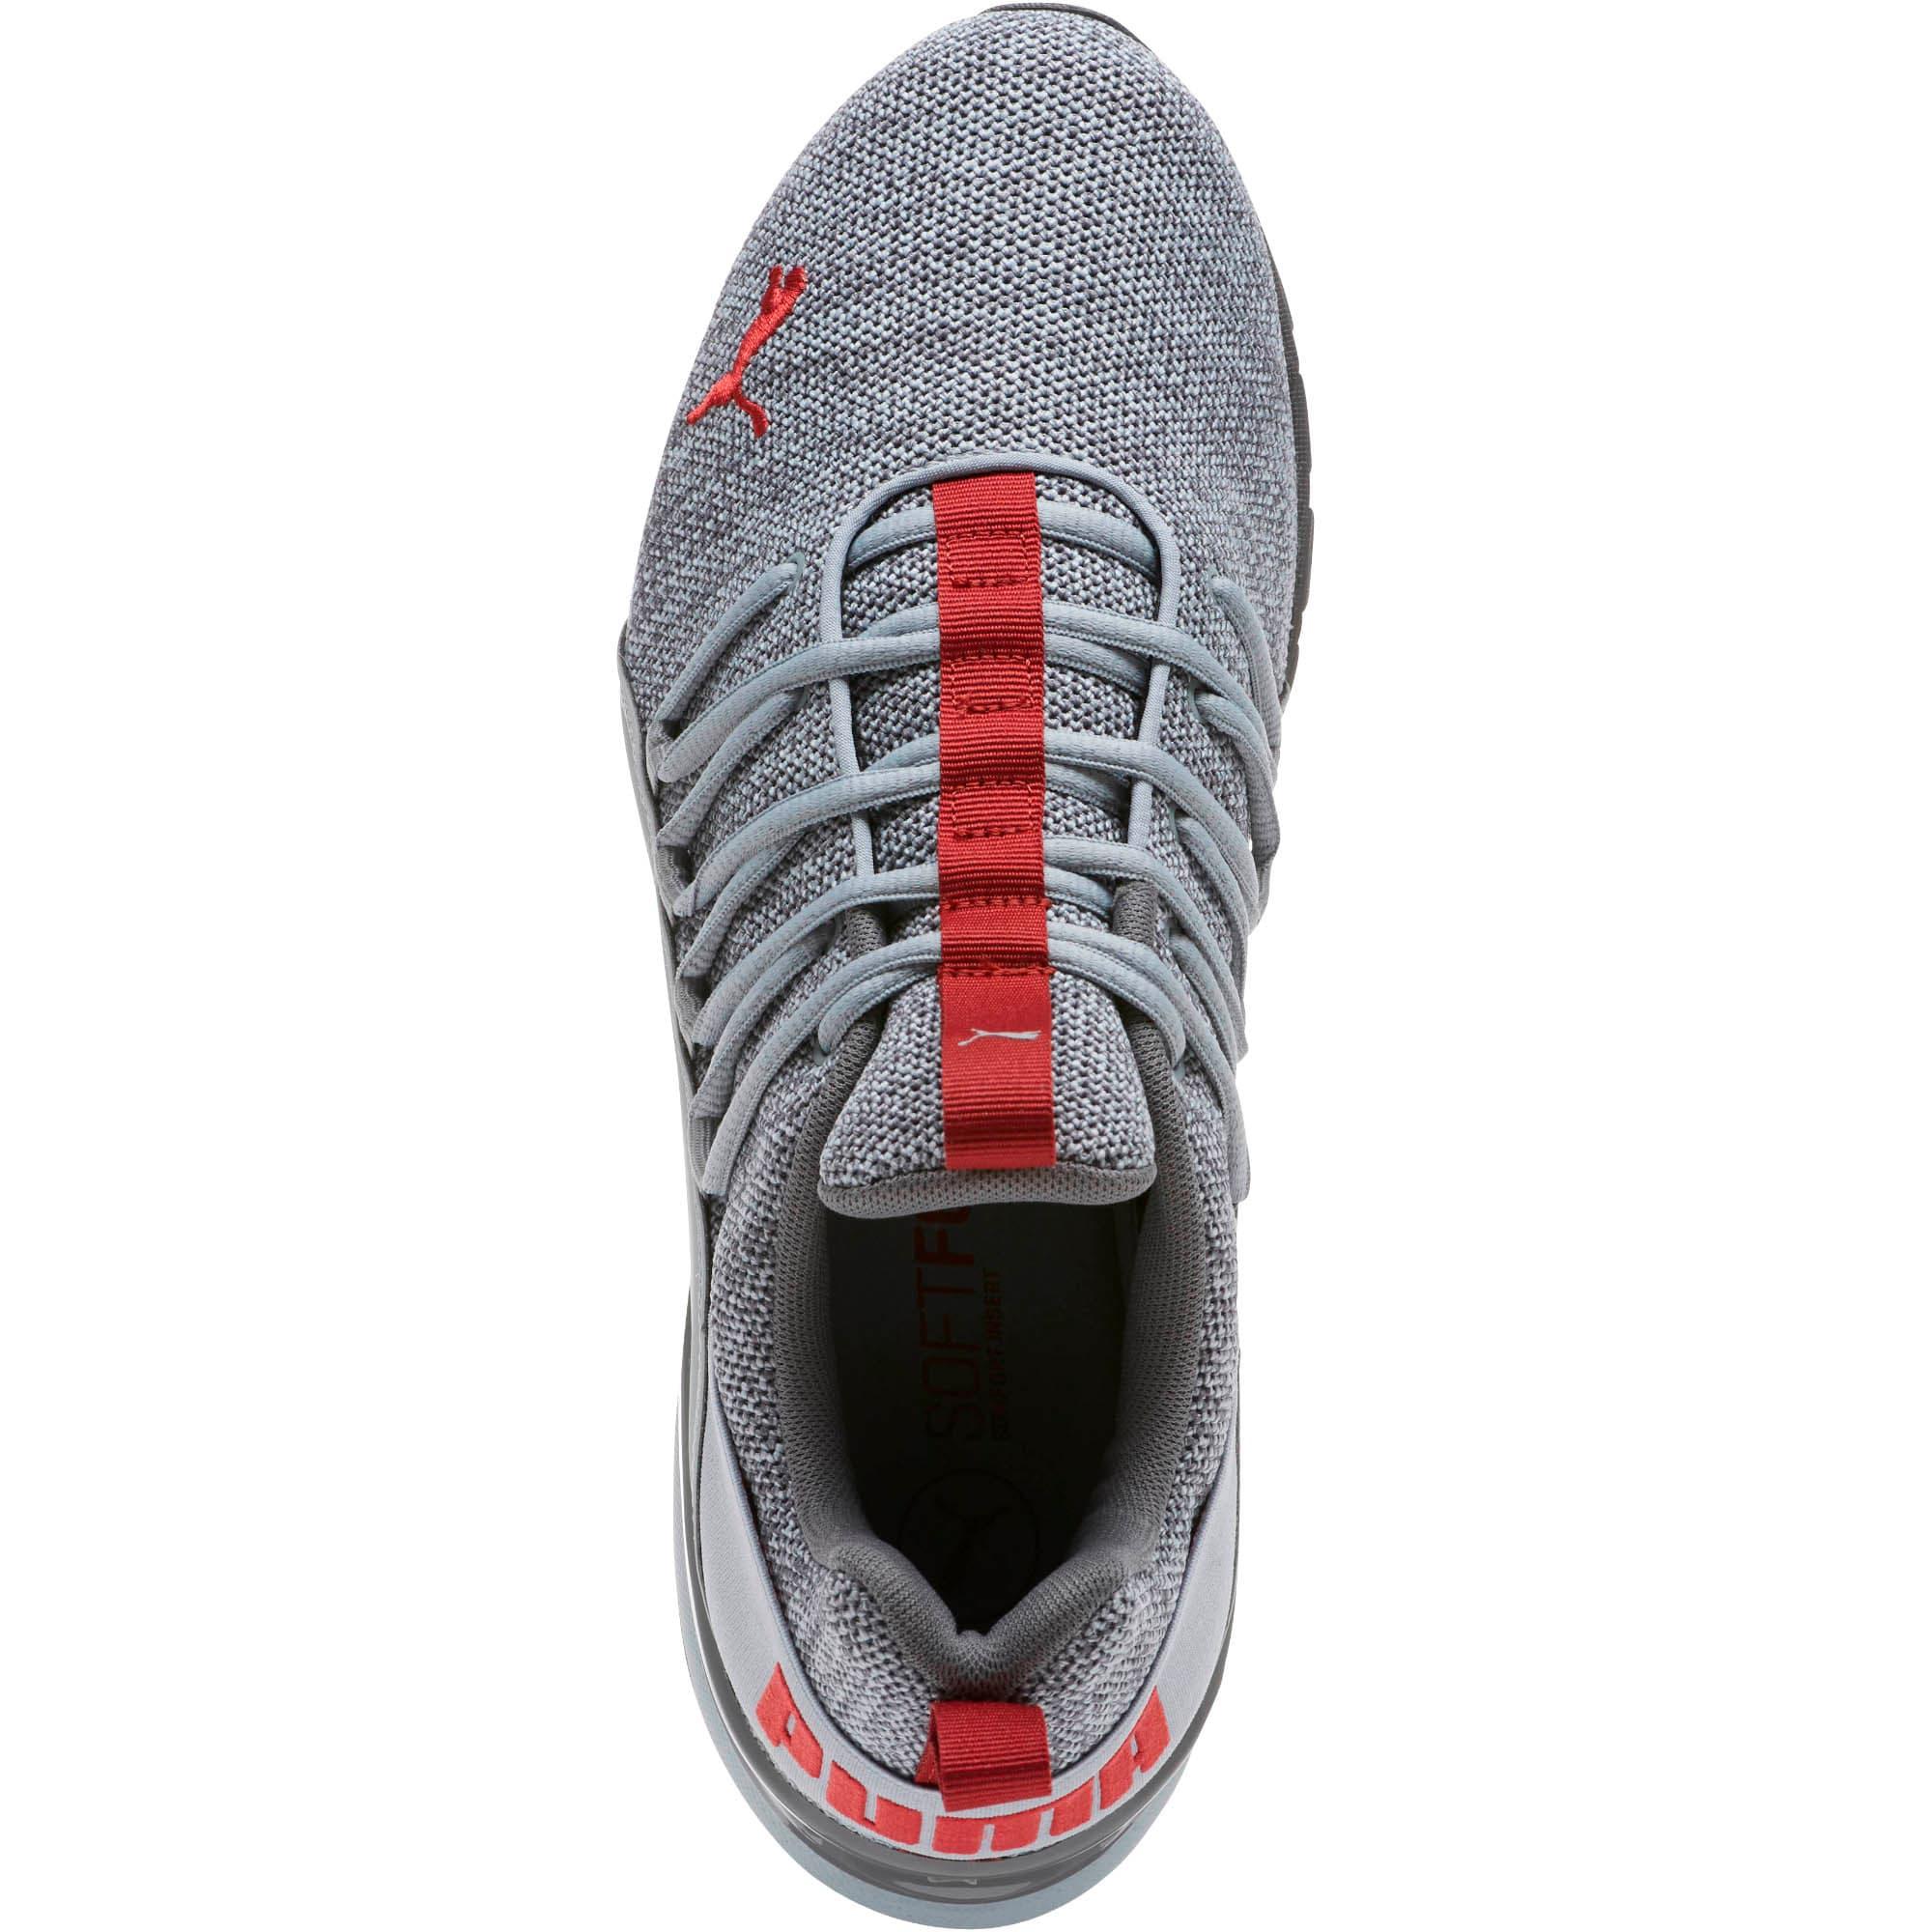 Thumbnail 5 of Axelion Men's Training Shoes, Quarry-QUIET SHADE-Red, medium